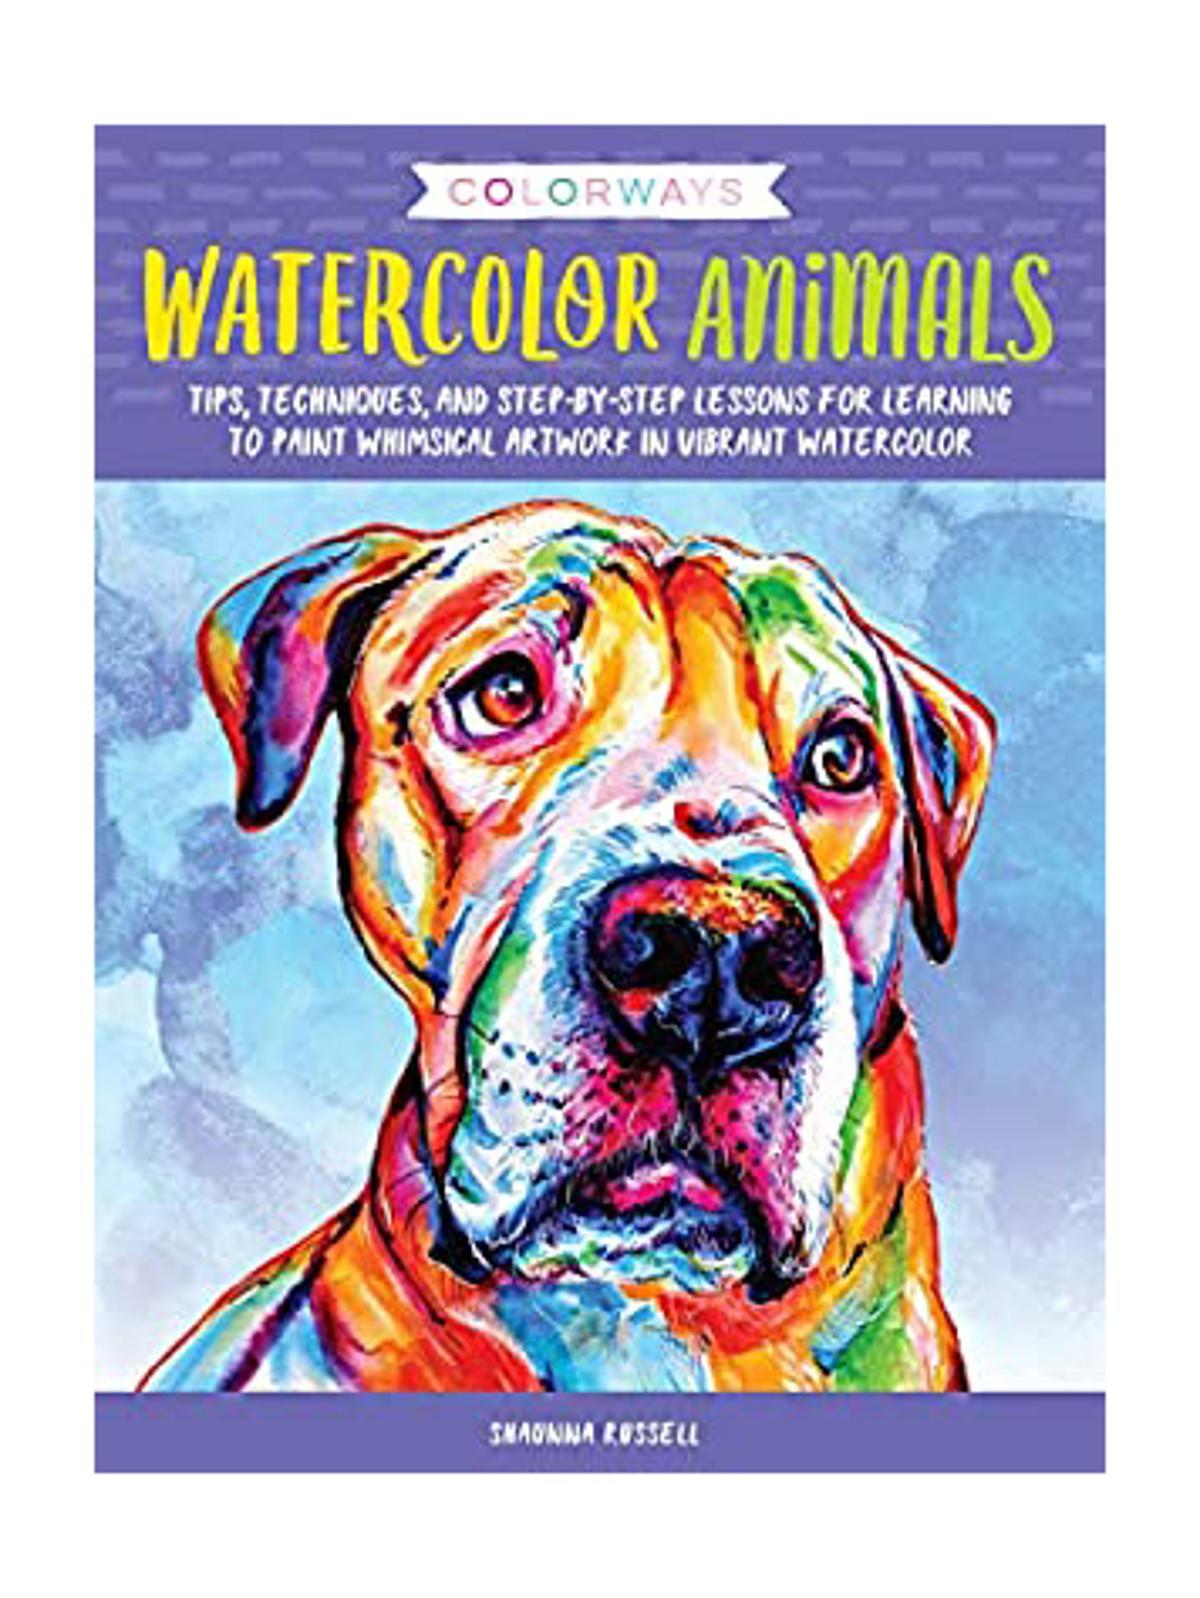 Walter Foster - Colorways: Watercolor Animals